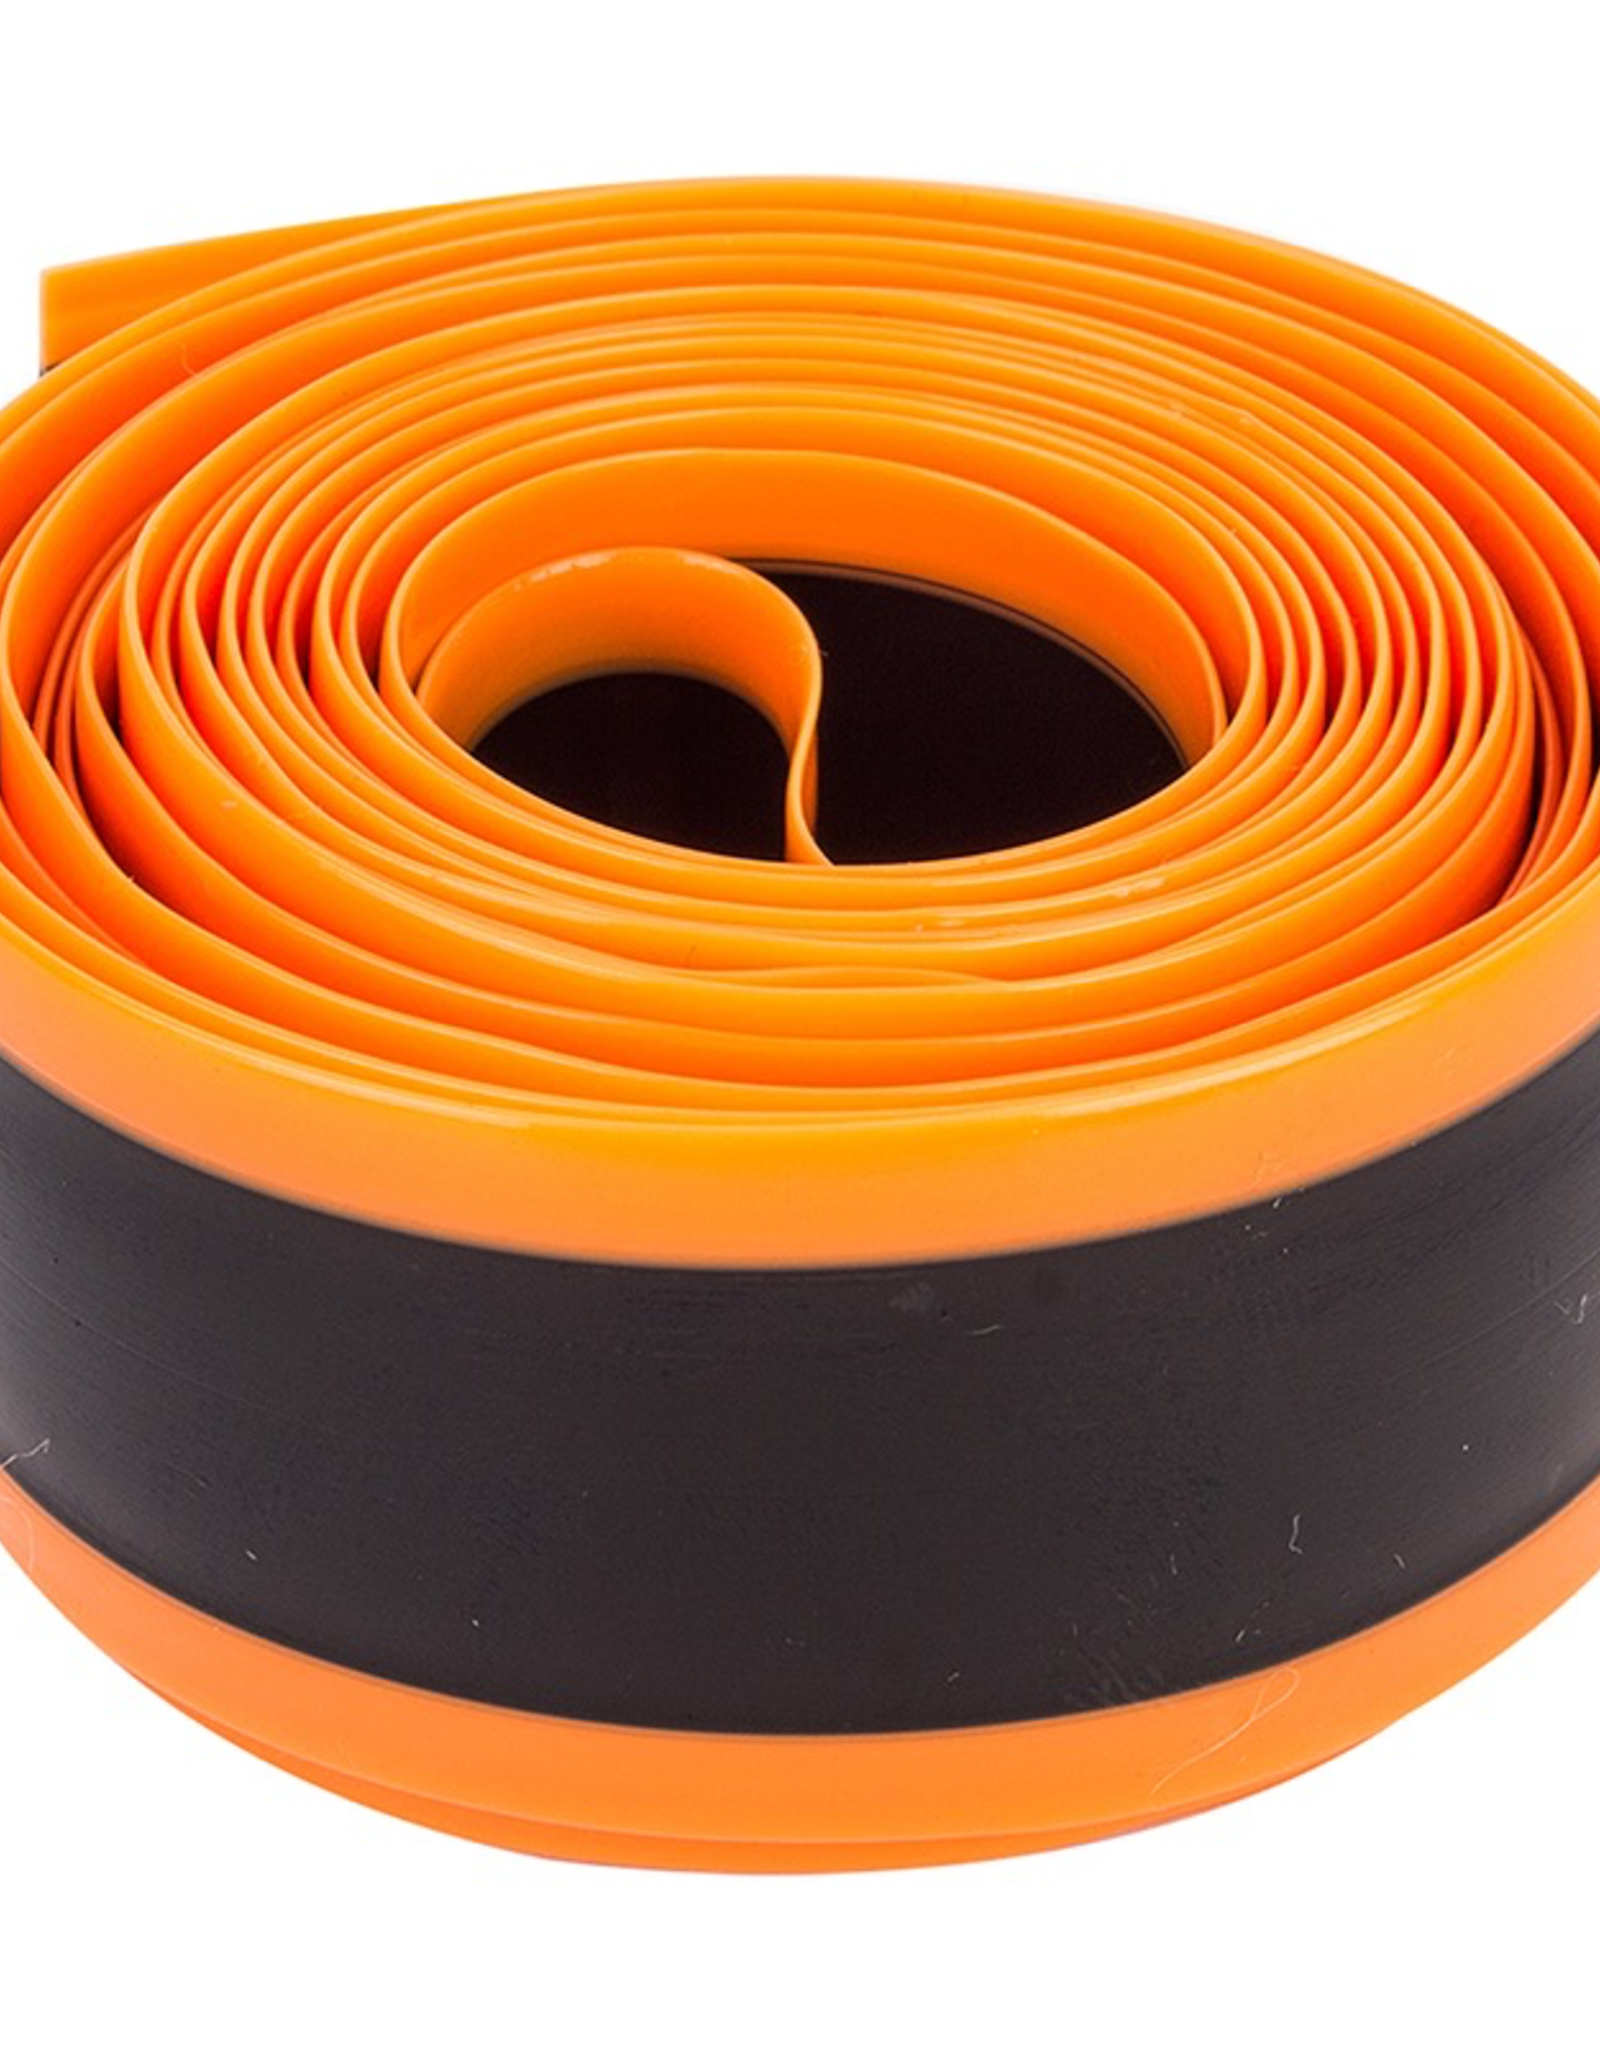 Mr. Tuffy Mr. Tuffy Tire Liner 700x20-25&27x1 27x1 ORG RD BKE #41102